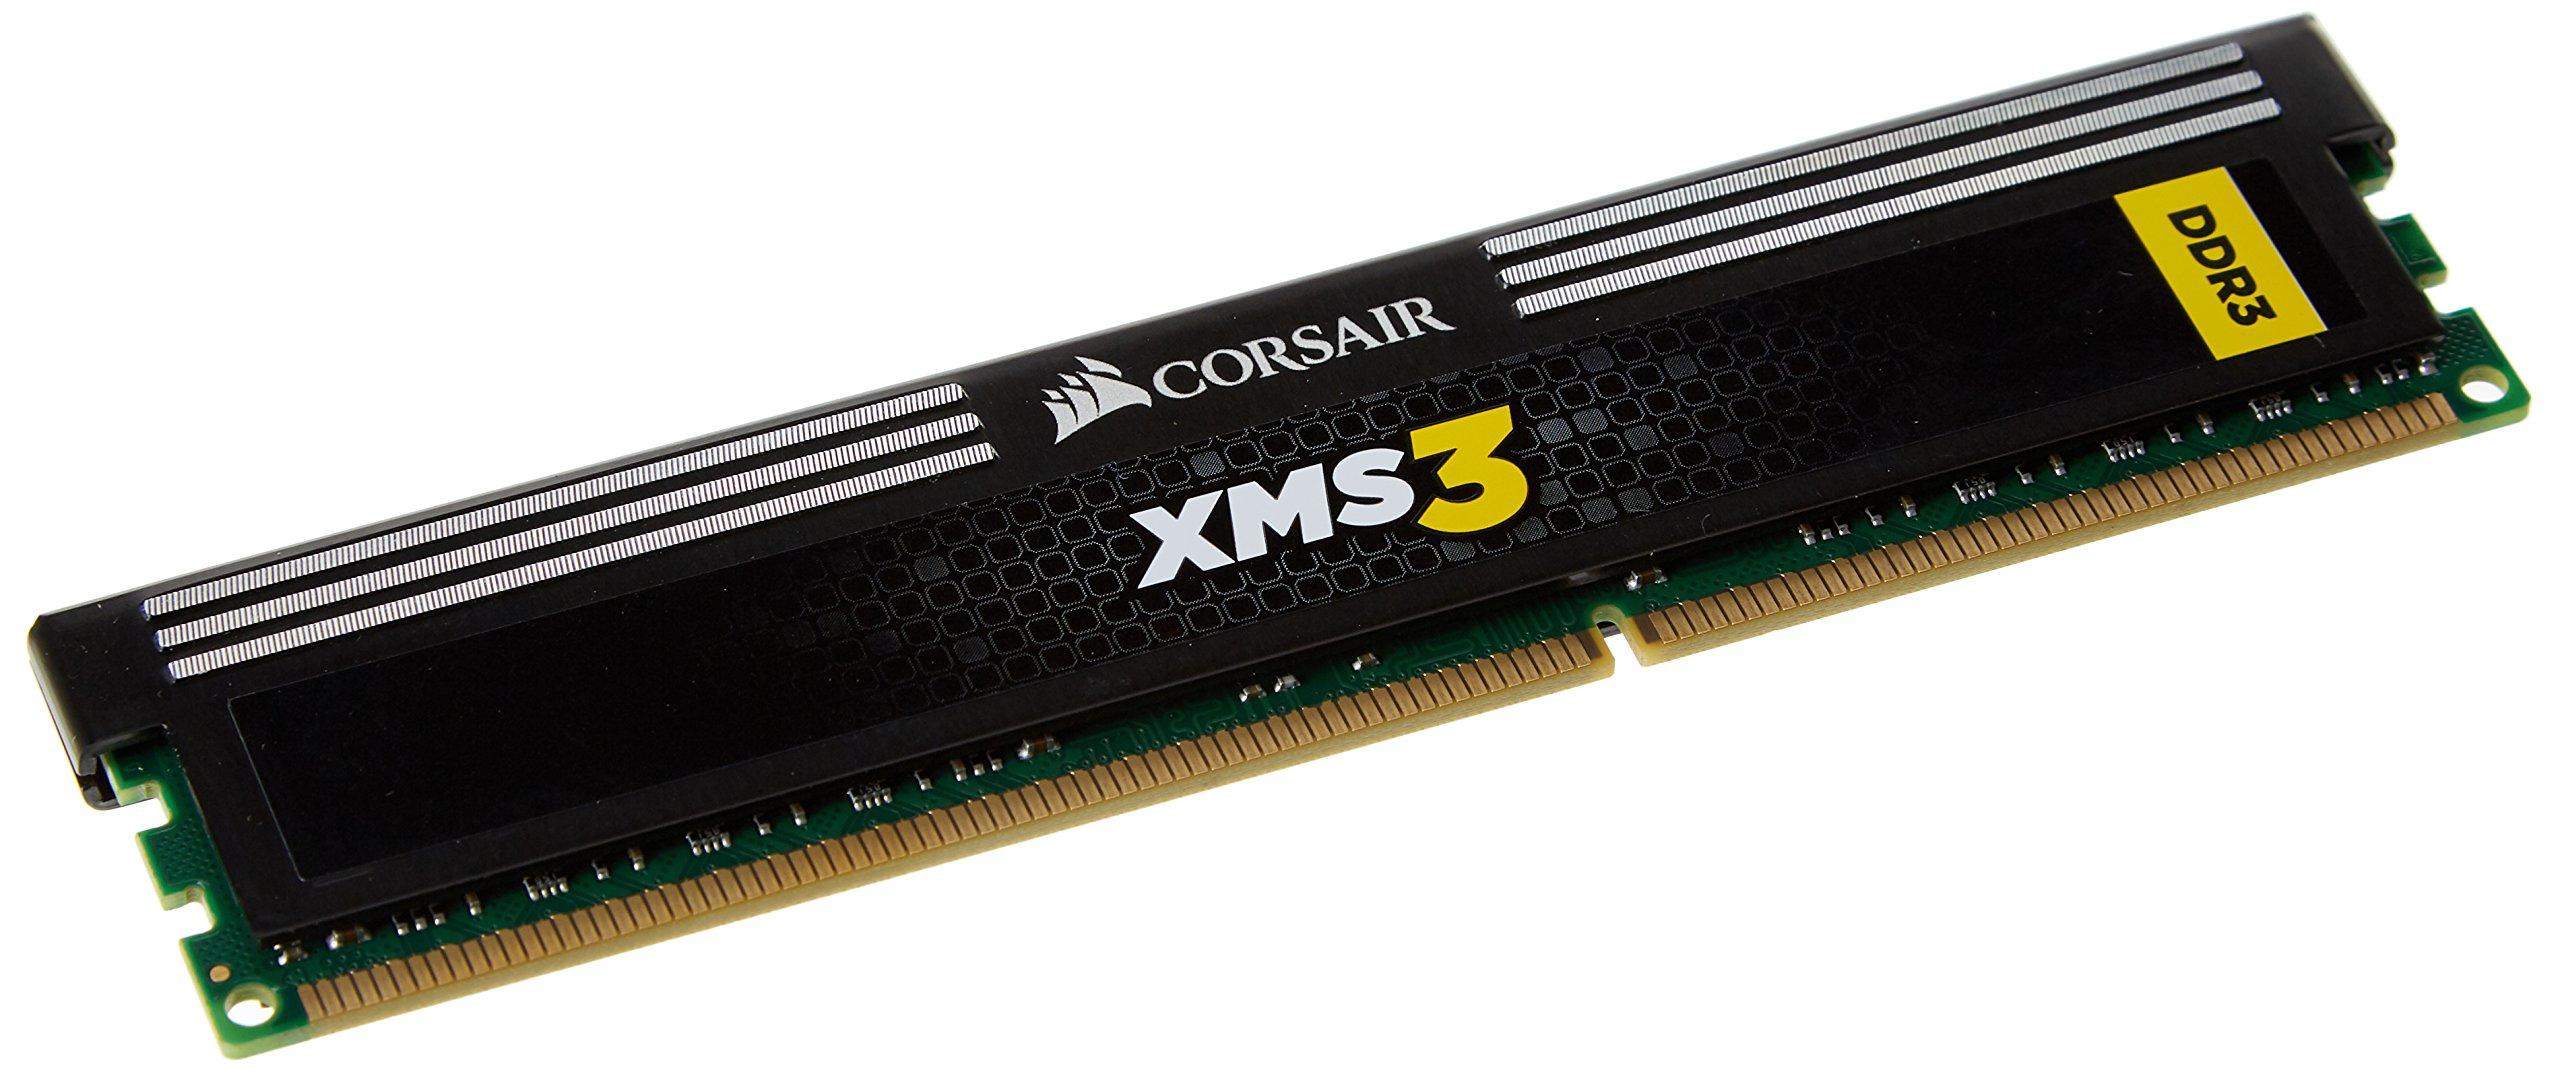 Memoria RAM 4GB Corsair CMX4GX3M1A1333C9 XMS3 1333MHz PC3-10666 240-pin DDR3 Kit para Core i3 i5 i7-1.5V